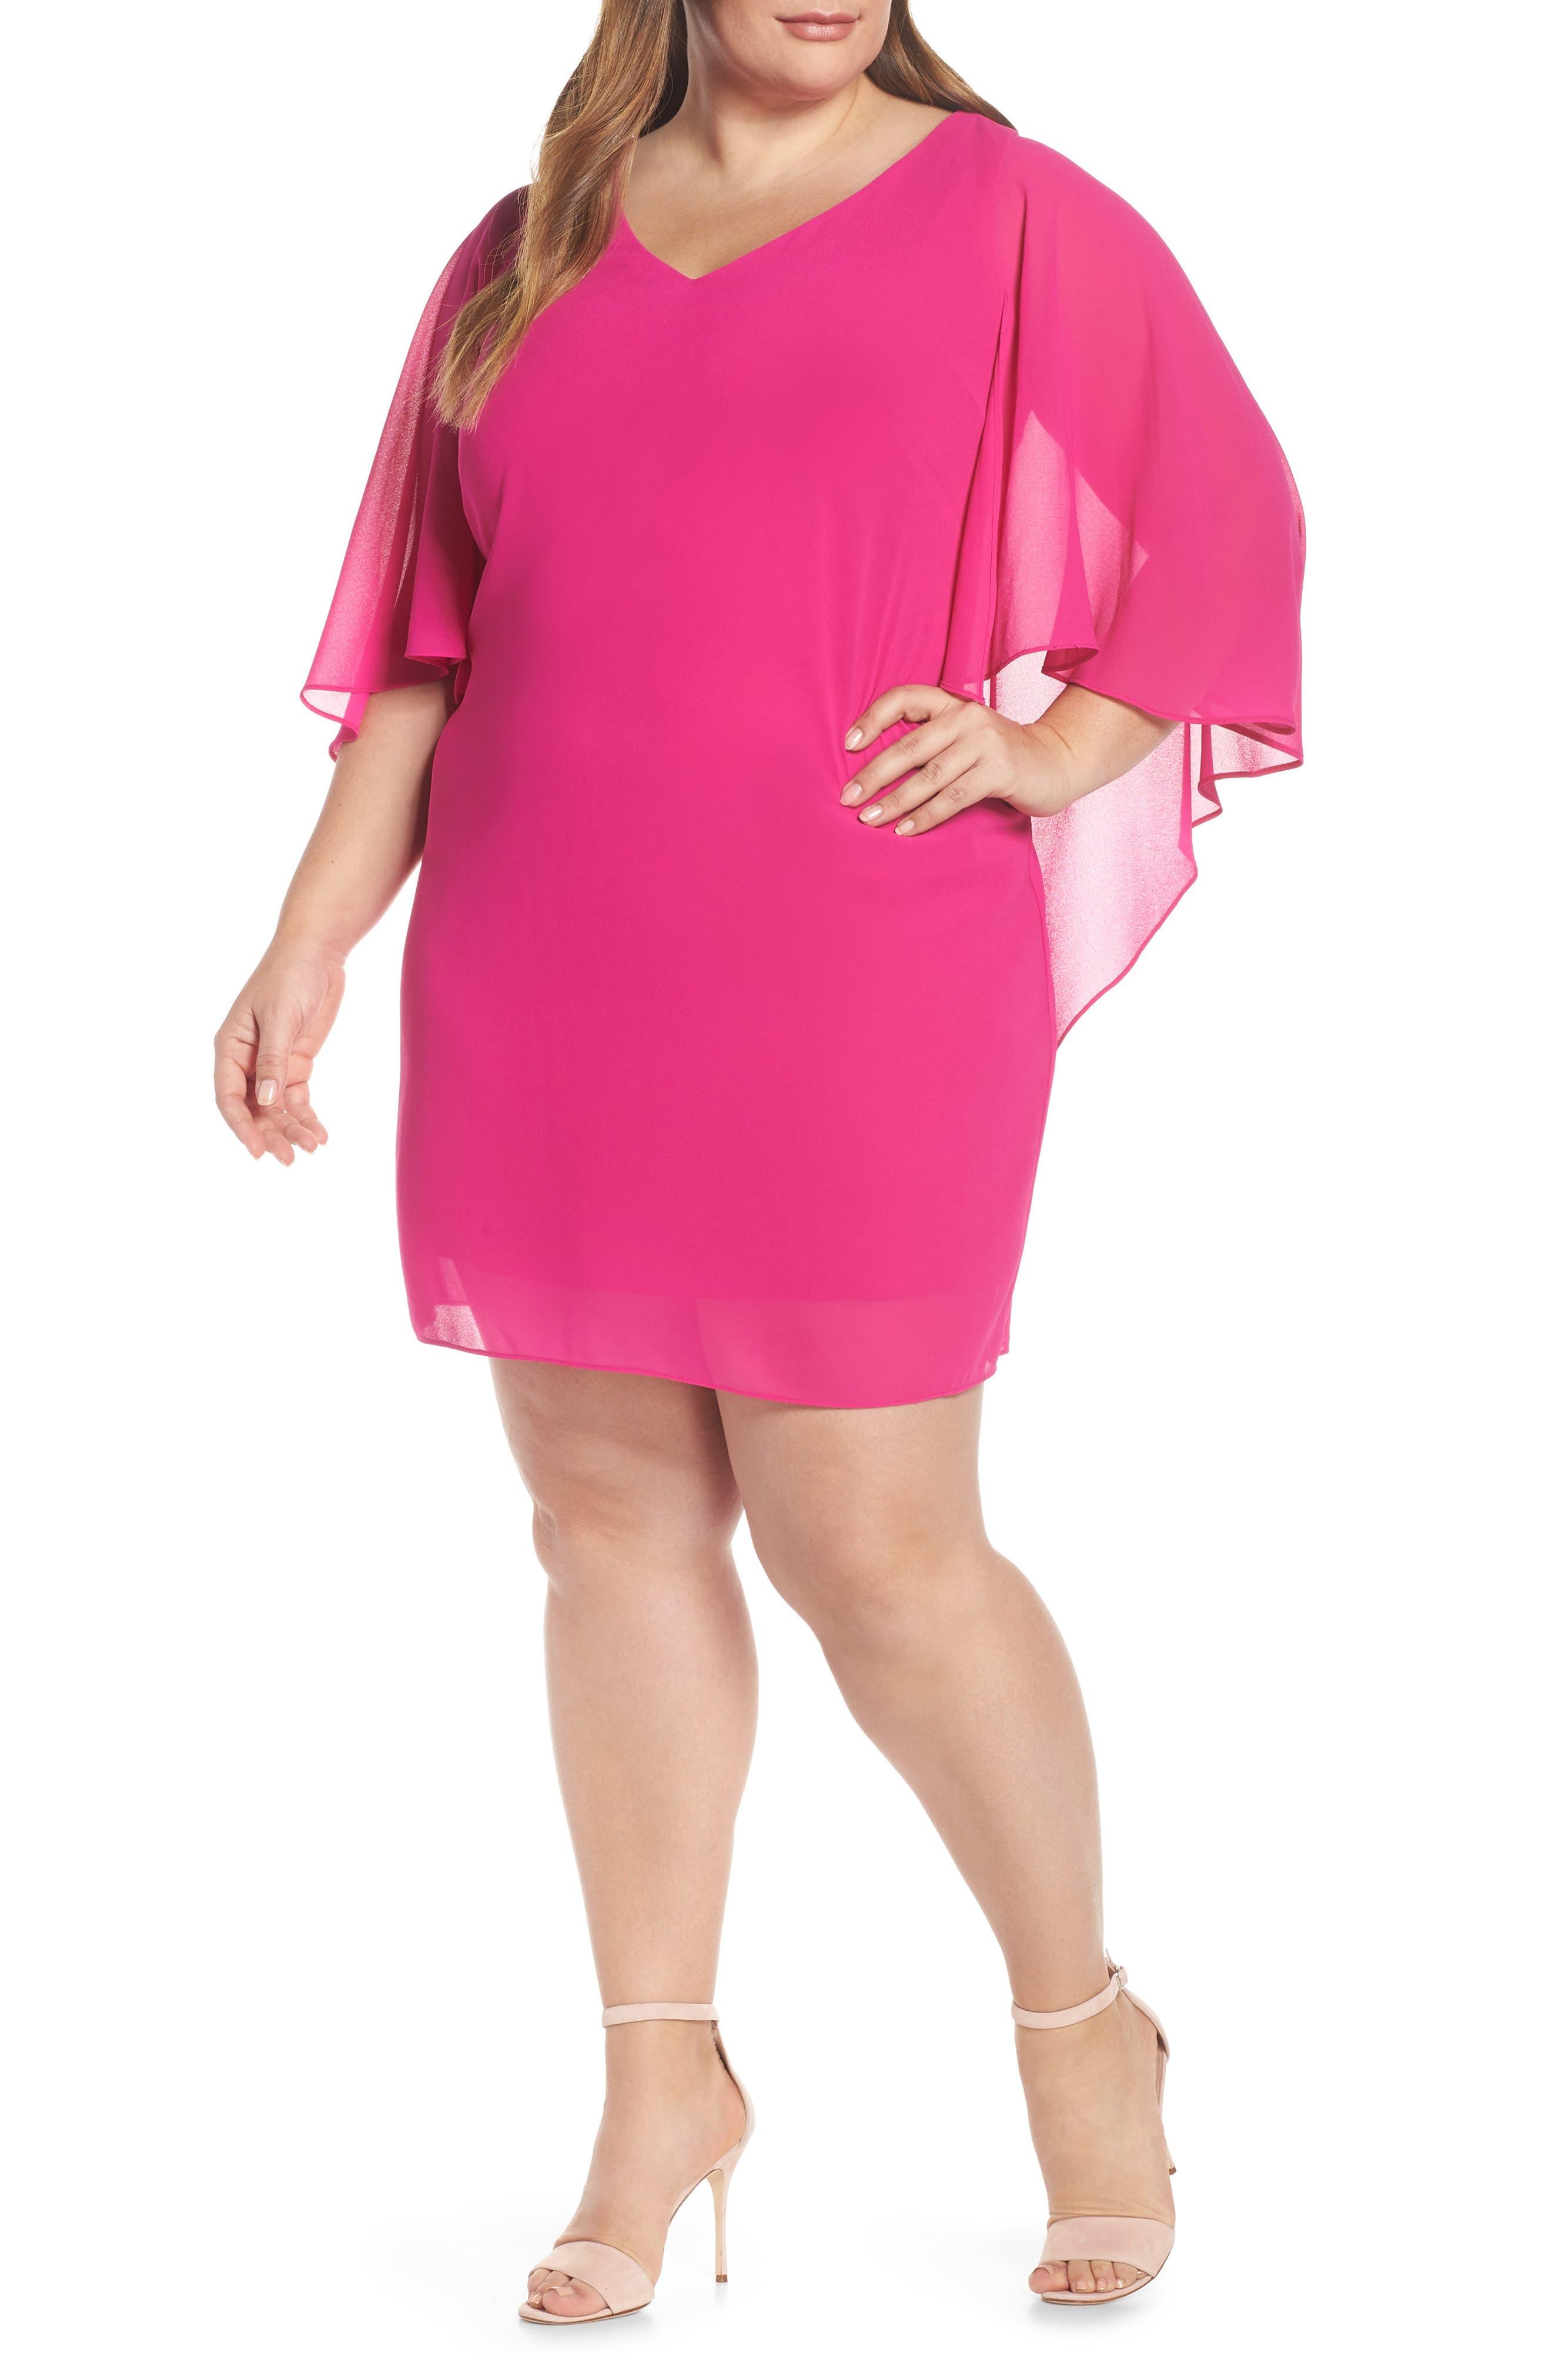 VINCE CAMUTO, Cape Back Shift Dress, Main thumbnail 1, color, FUCHSIA